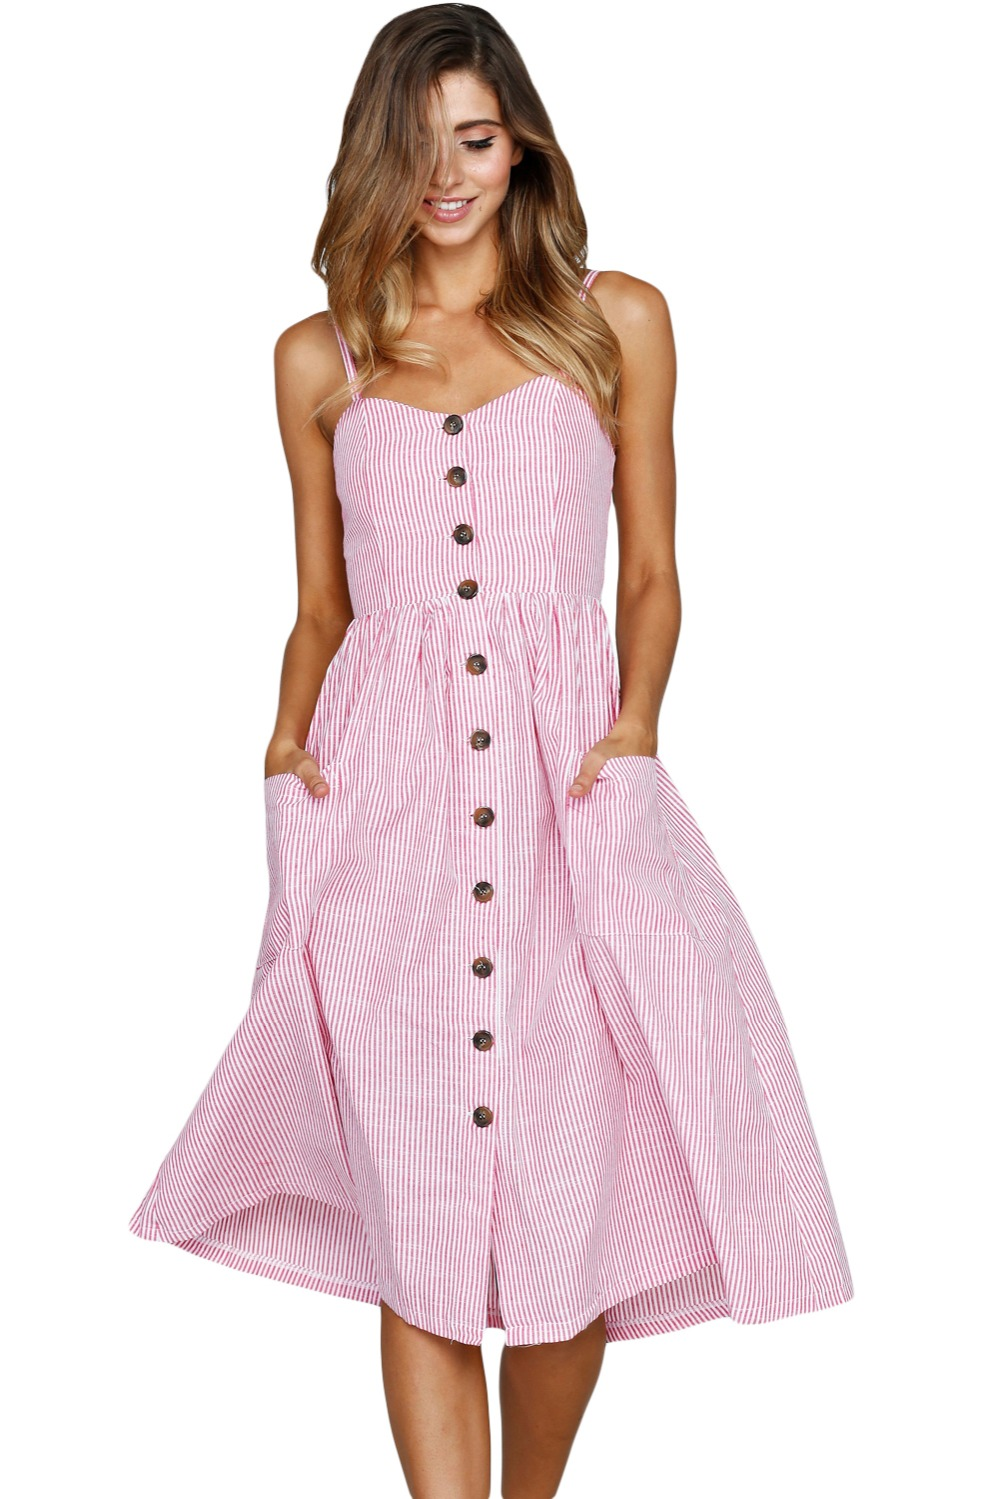 5ac87f5e6d1 Zmvkgsoa Long Sundress Sexxy Casual Spaghetti Strap Blue White Striped  Button Down Mid Calf Dress Boho Vestido Female VV610030-in Dresses from  Women s ...